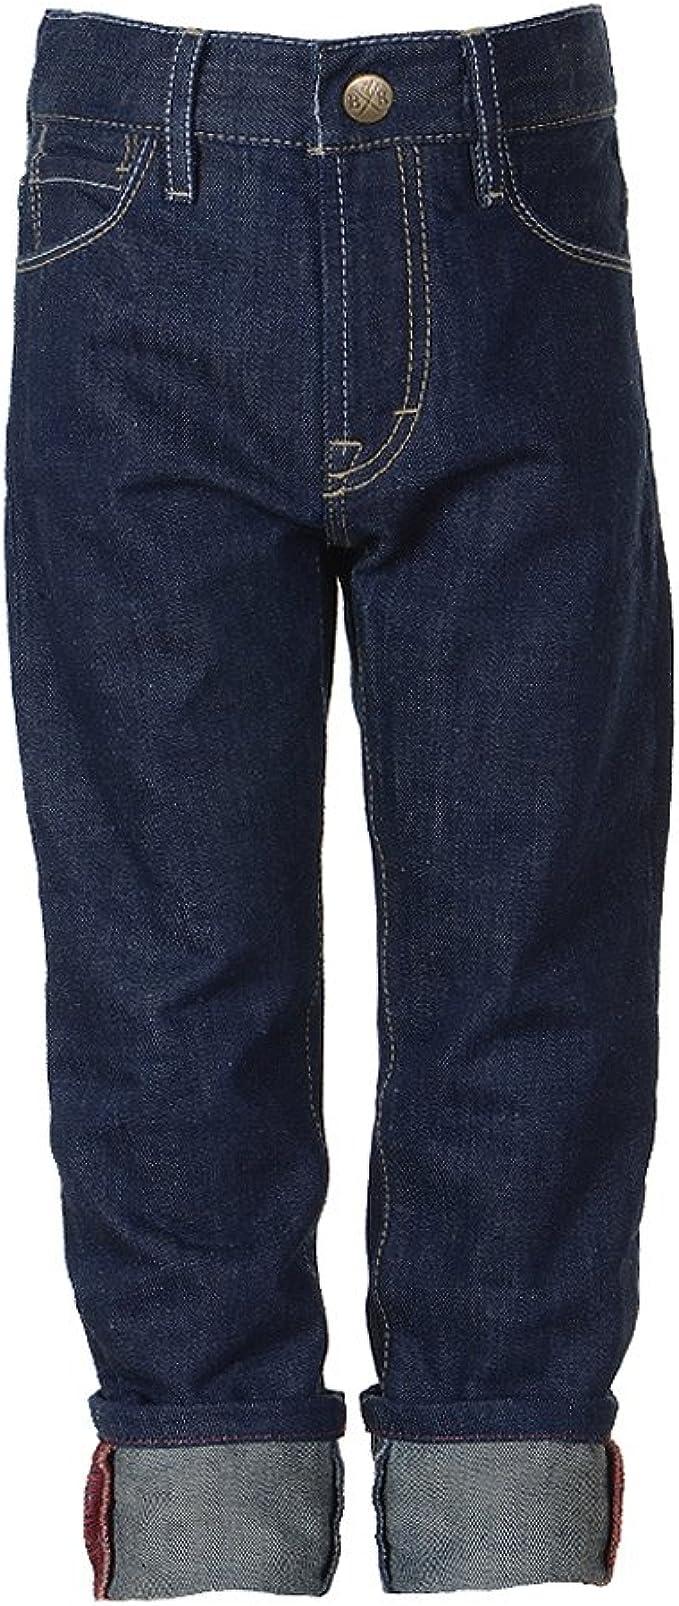 Band of Rascals Kinder Jeans Hose Slim Fit 100/% Bio-Baumwolle